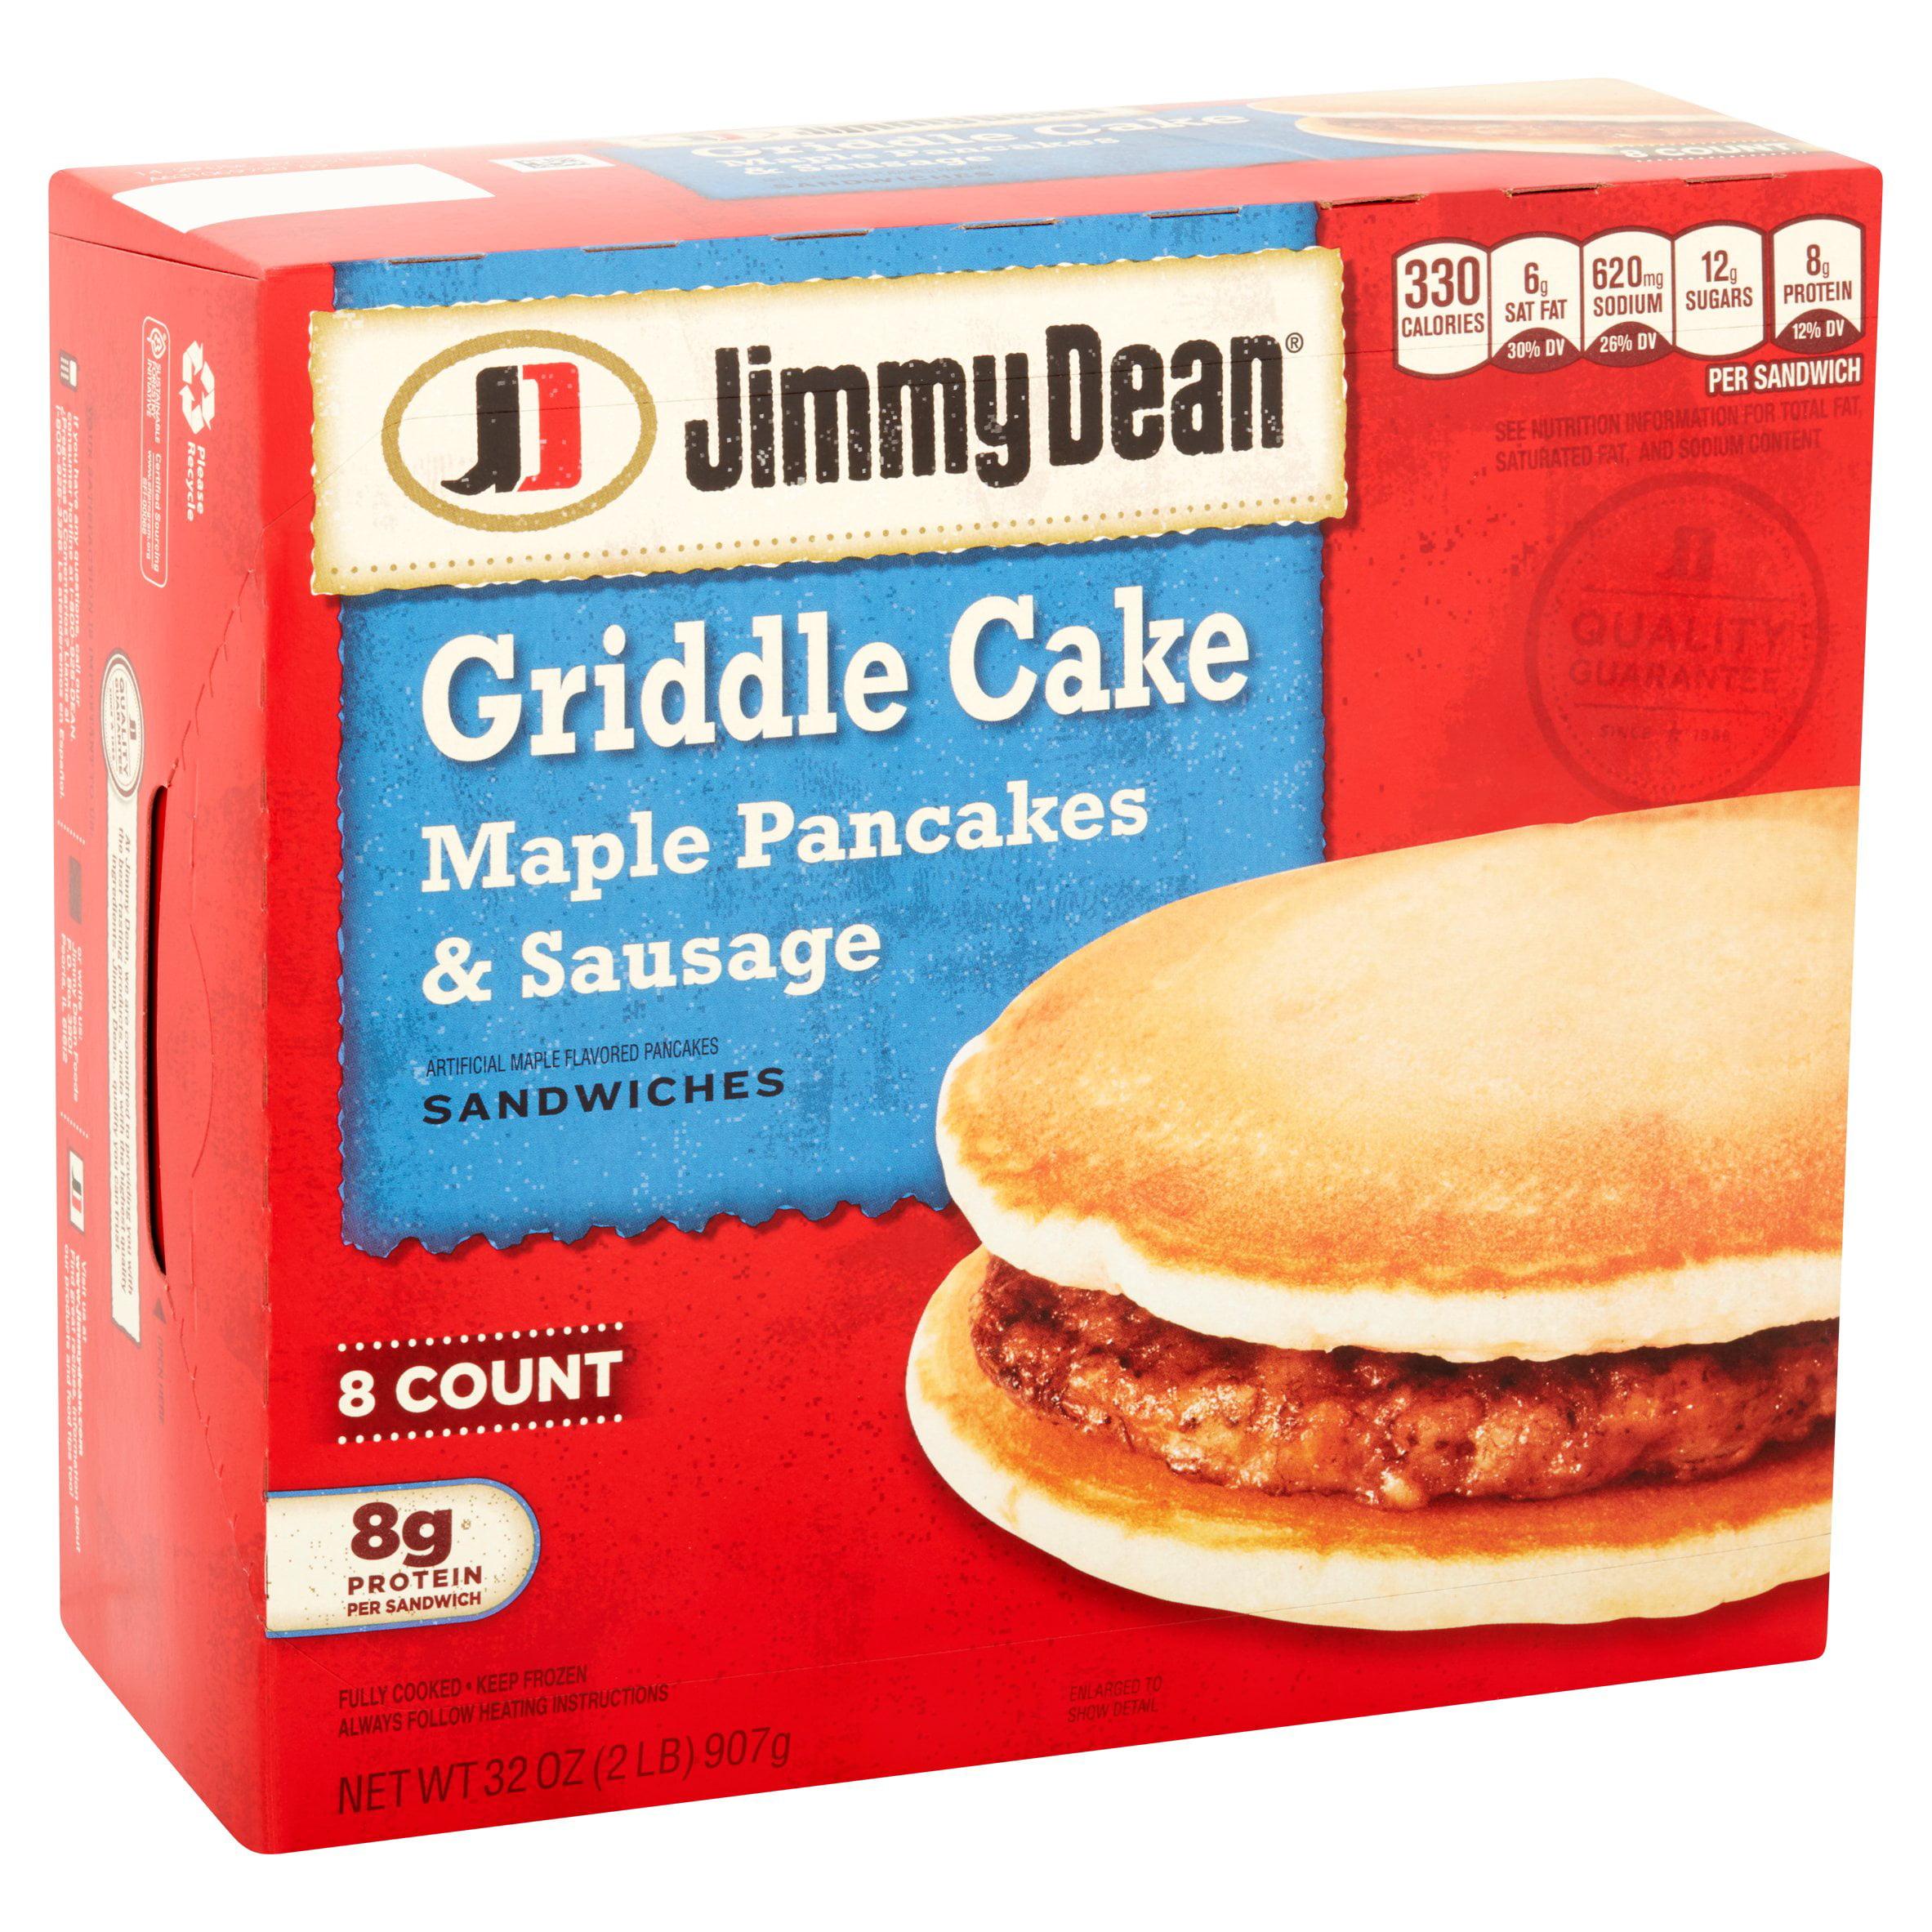 All Natural Gluten Free Pancakes